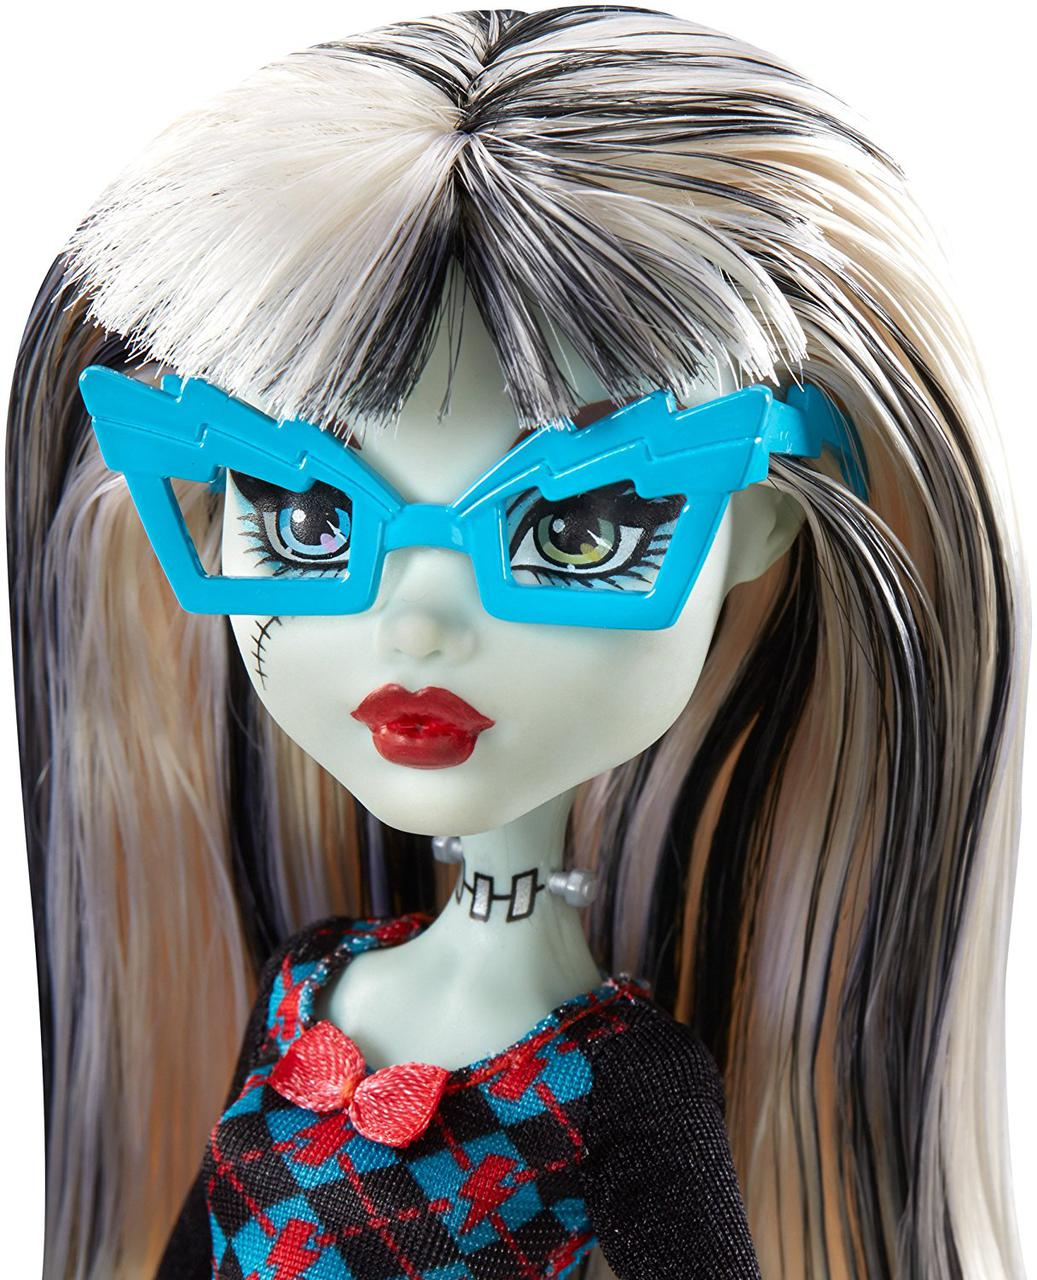 Френки Штейн серия Крик Гиков Гик Шрик Кукла Монстер Хай Monster High Geek Shriek Frankie Stein